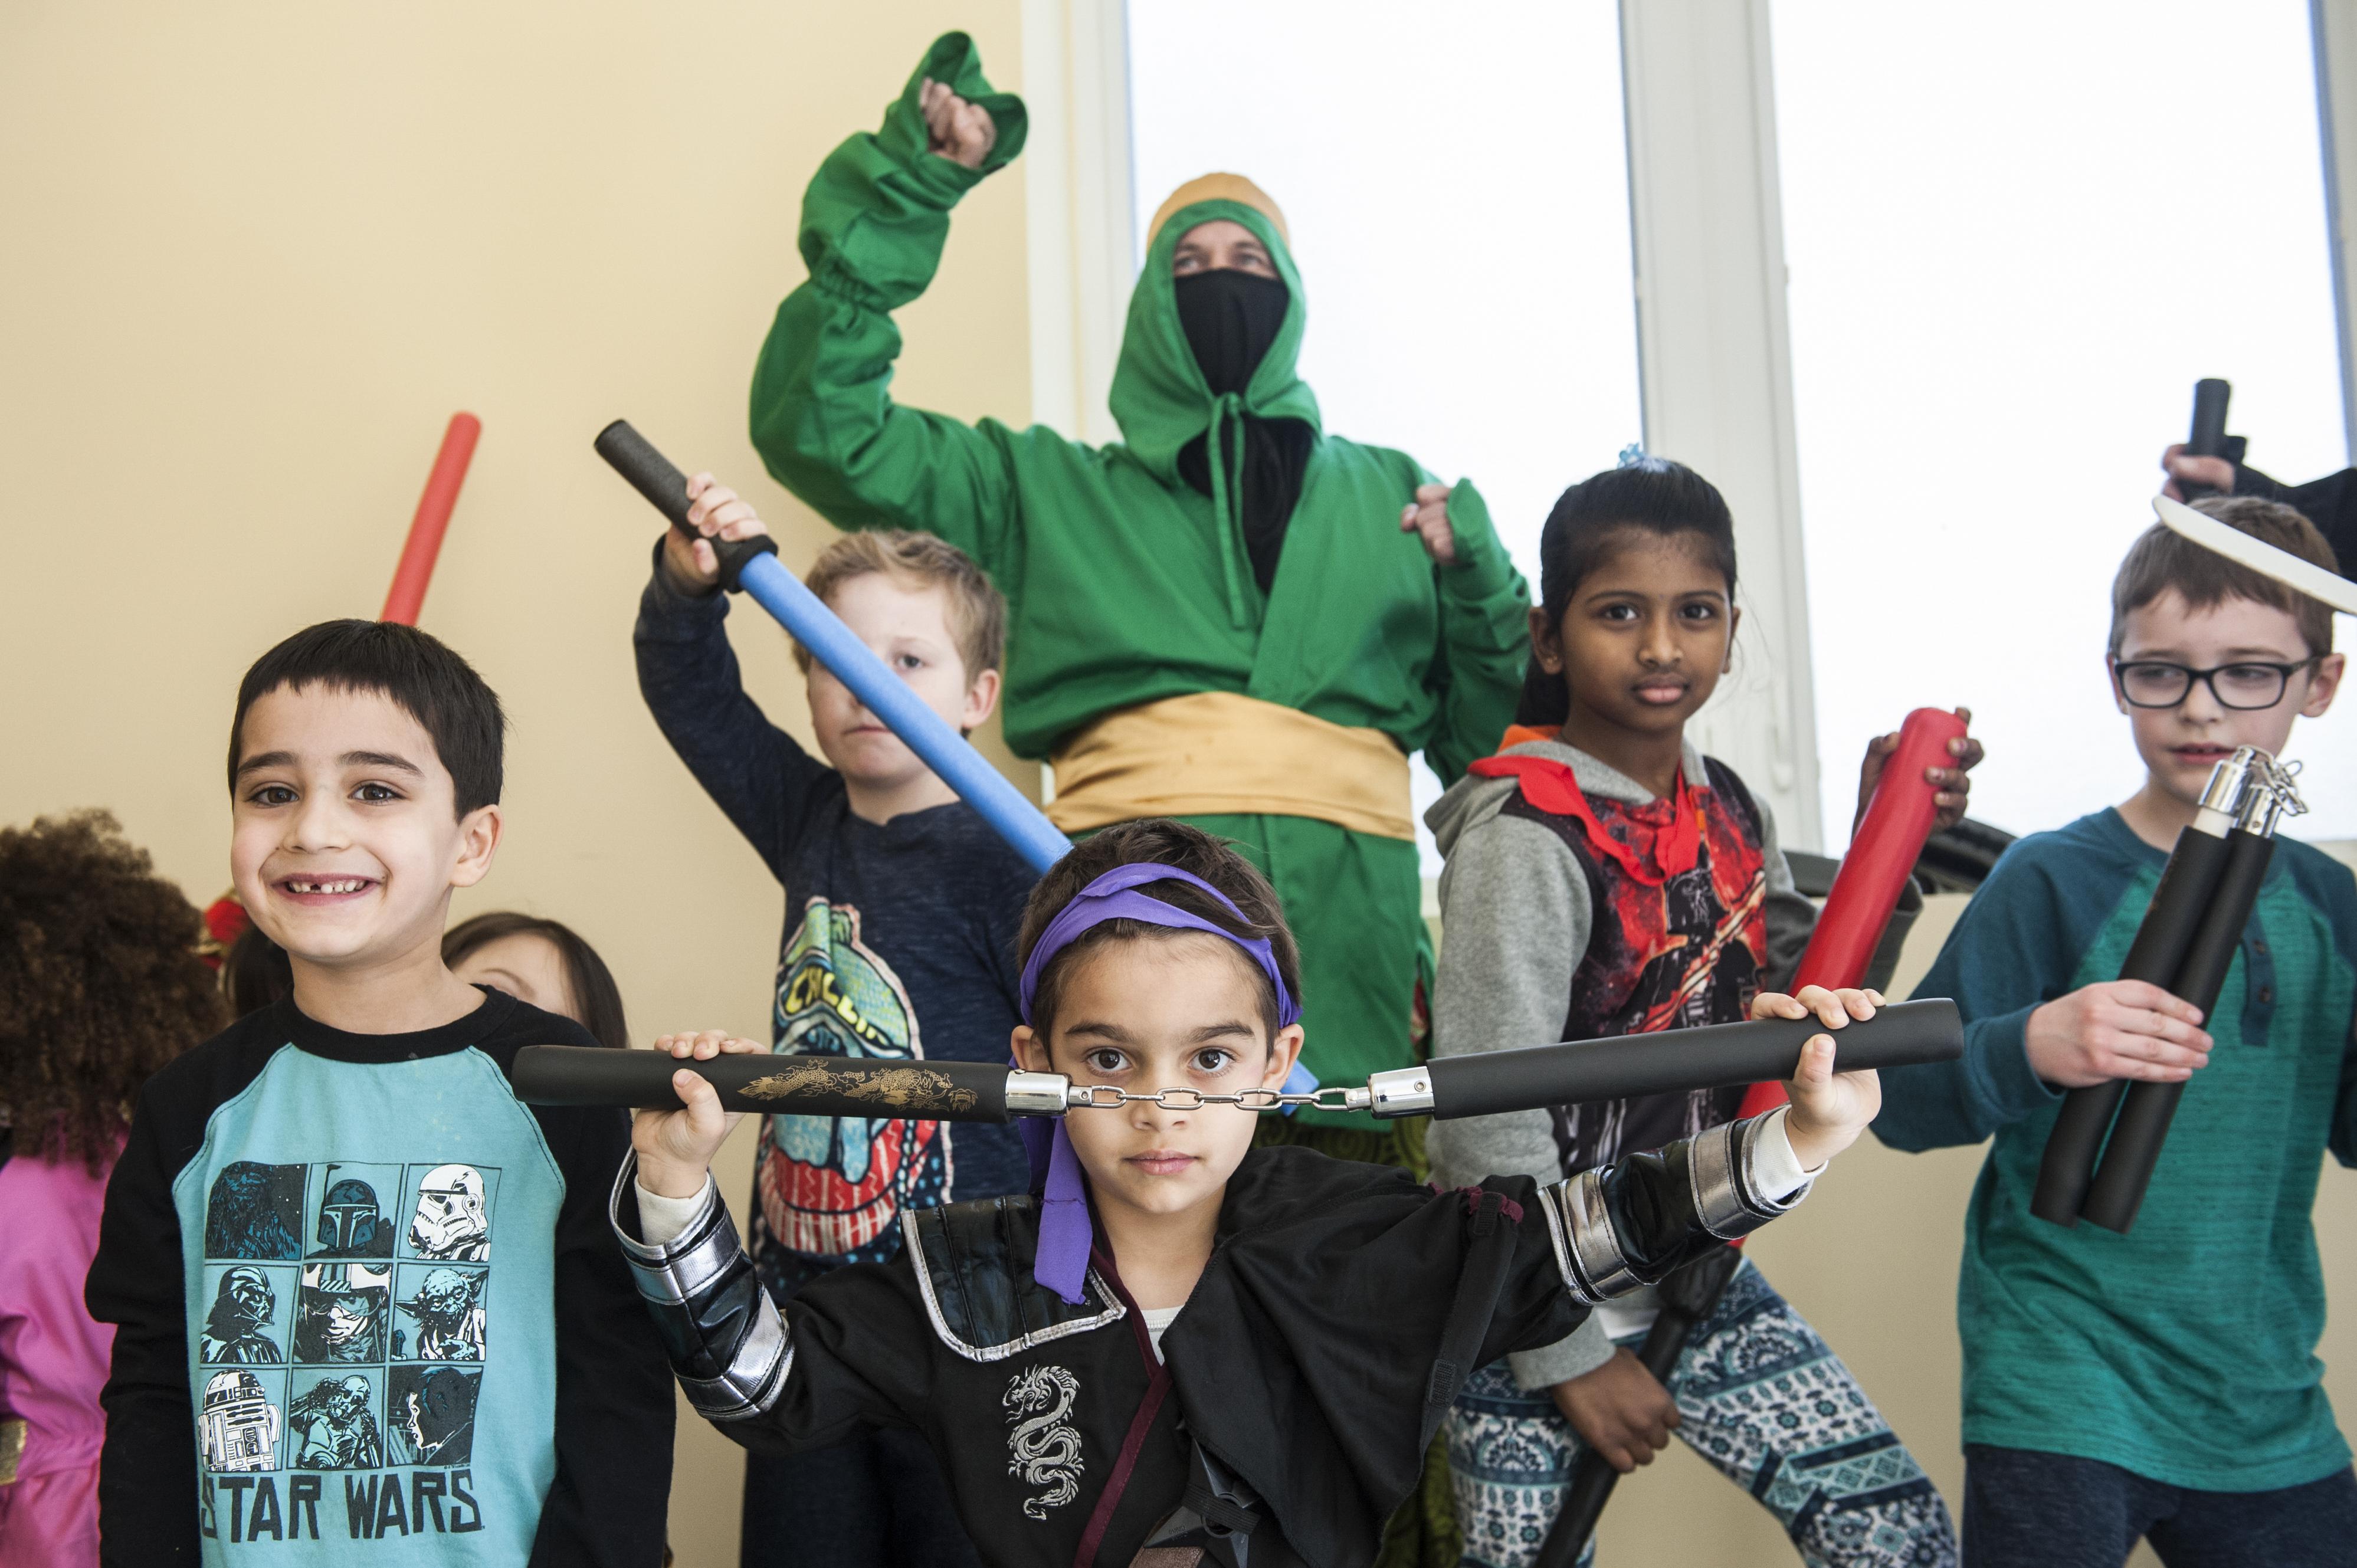 ninja_party-225